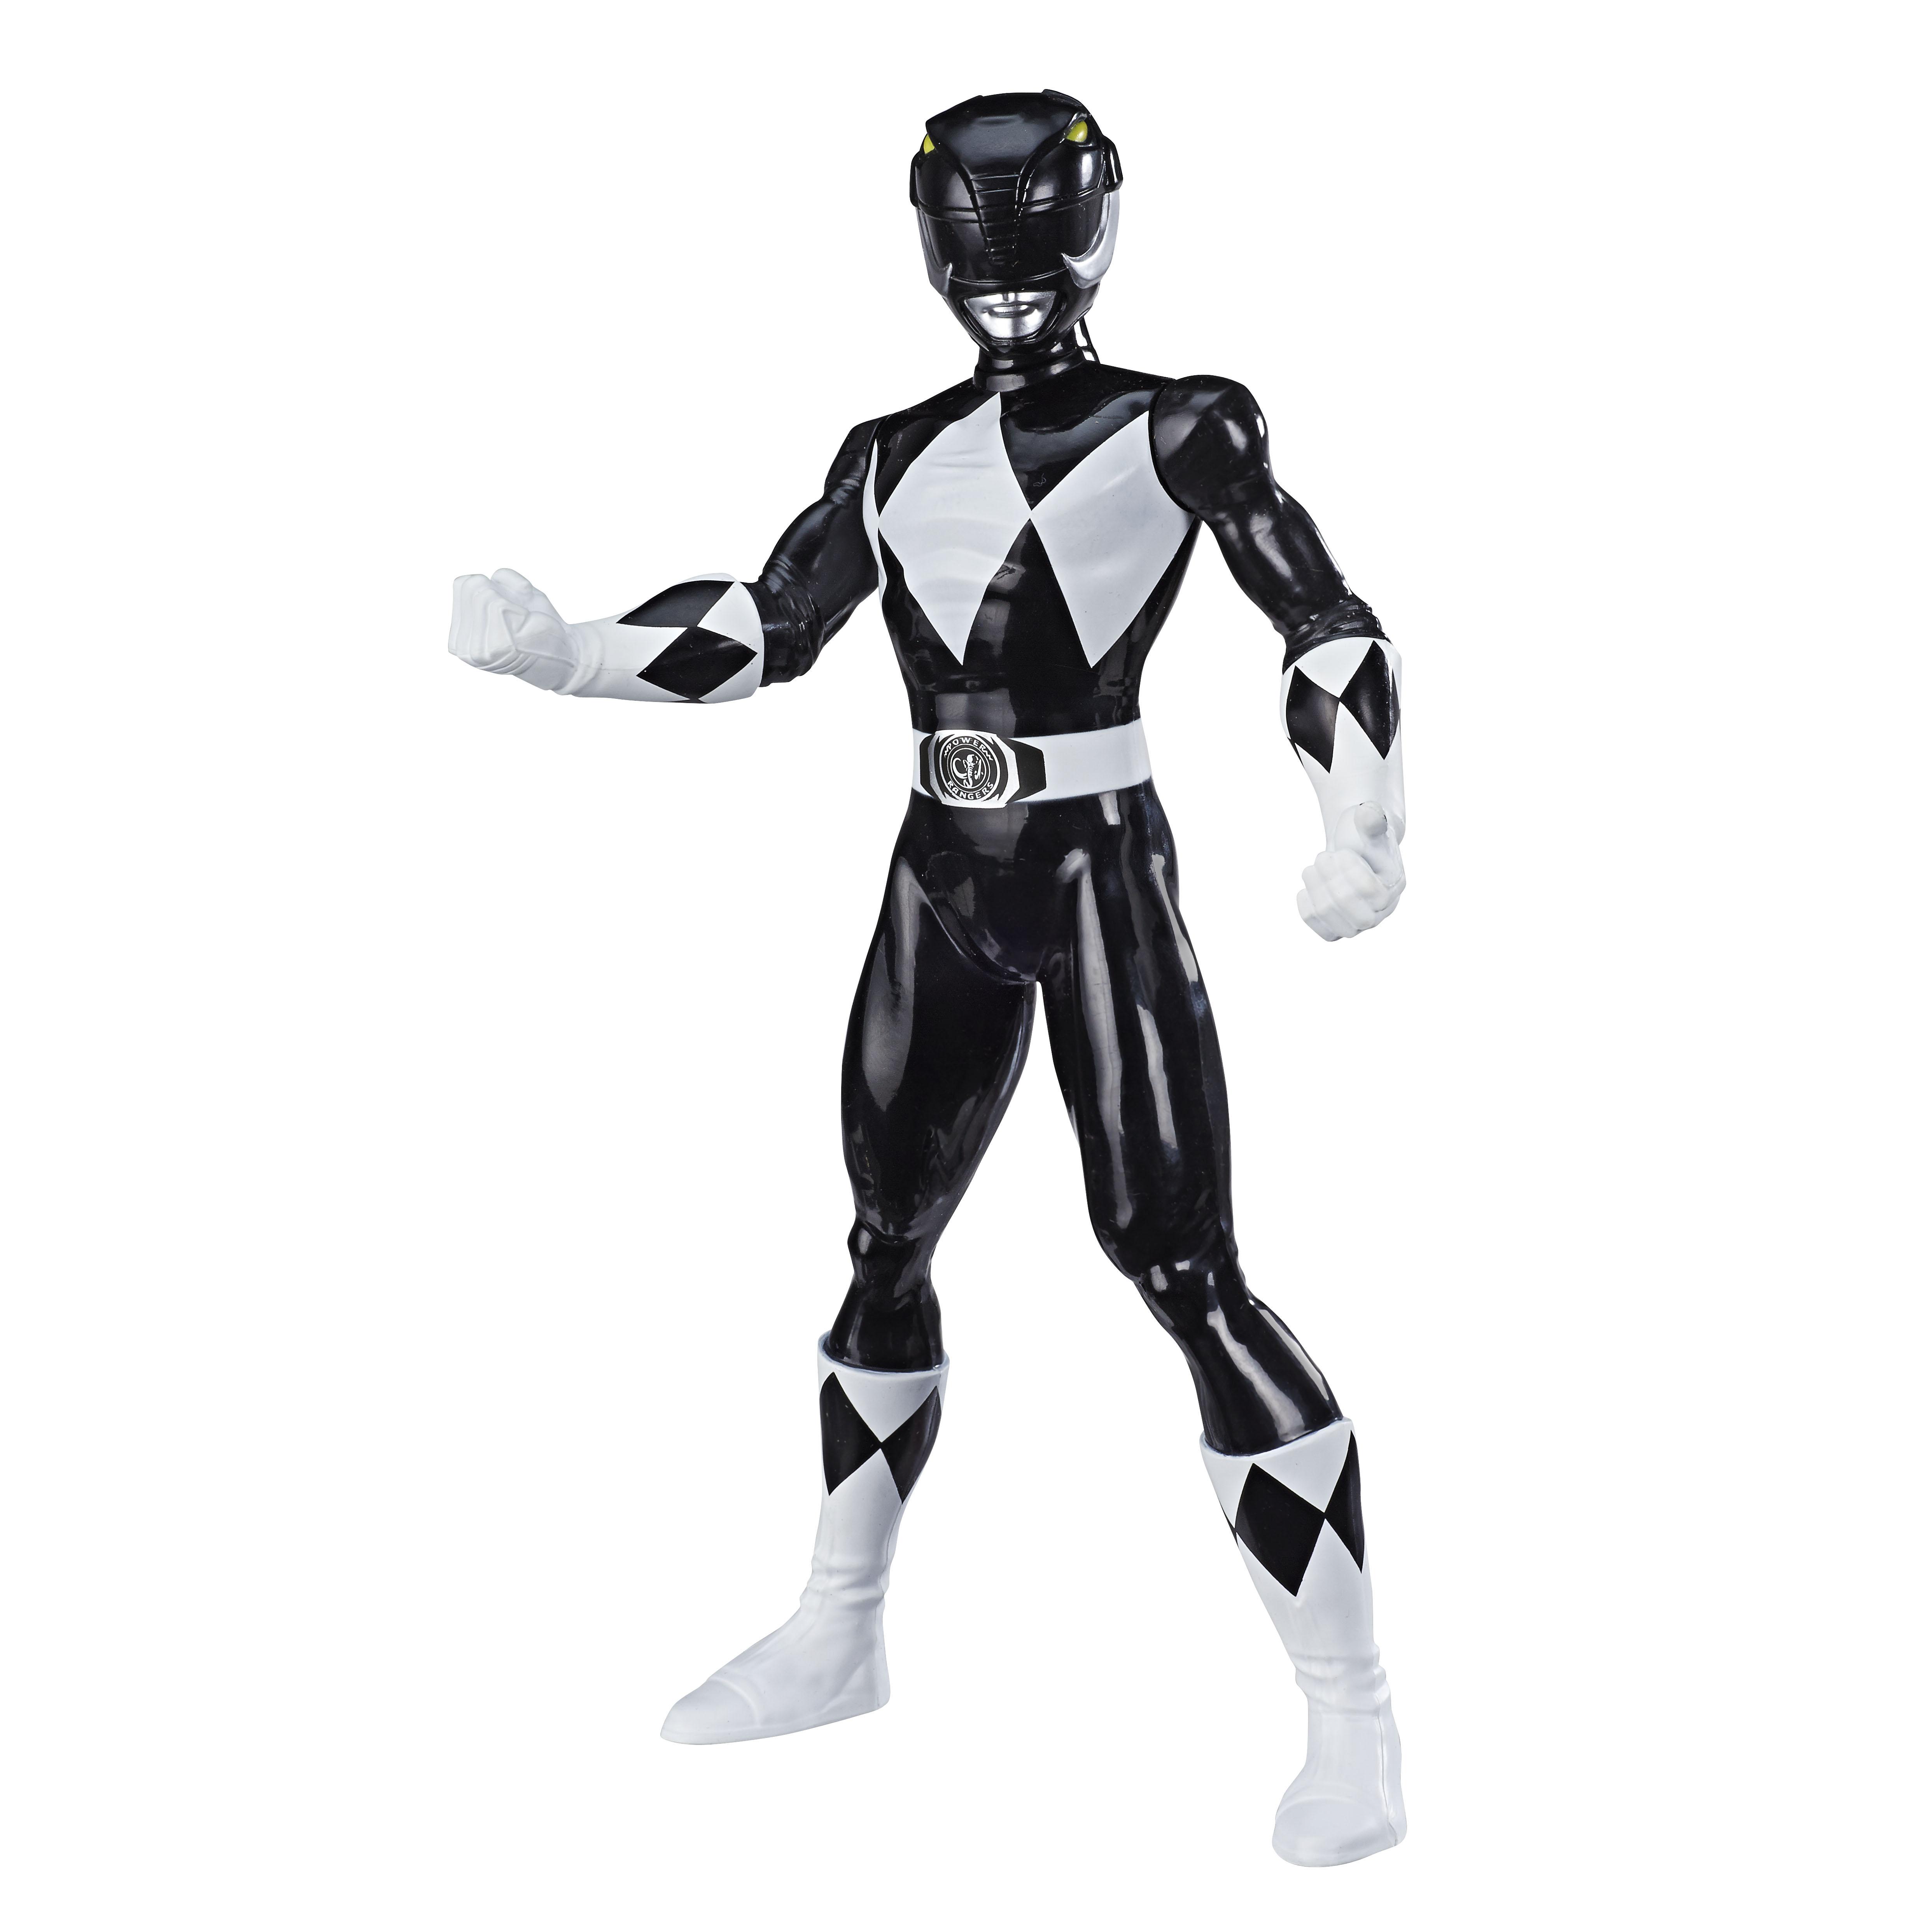 E7898 MMPR 9.5 Inch Basic Figures Black Ranger_OOP